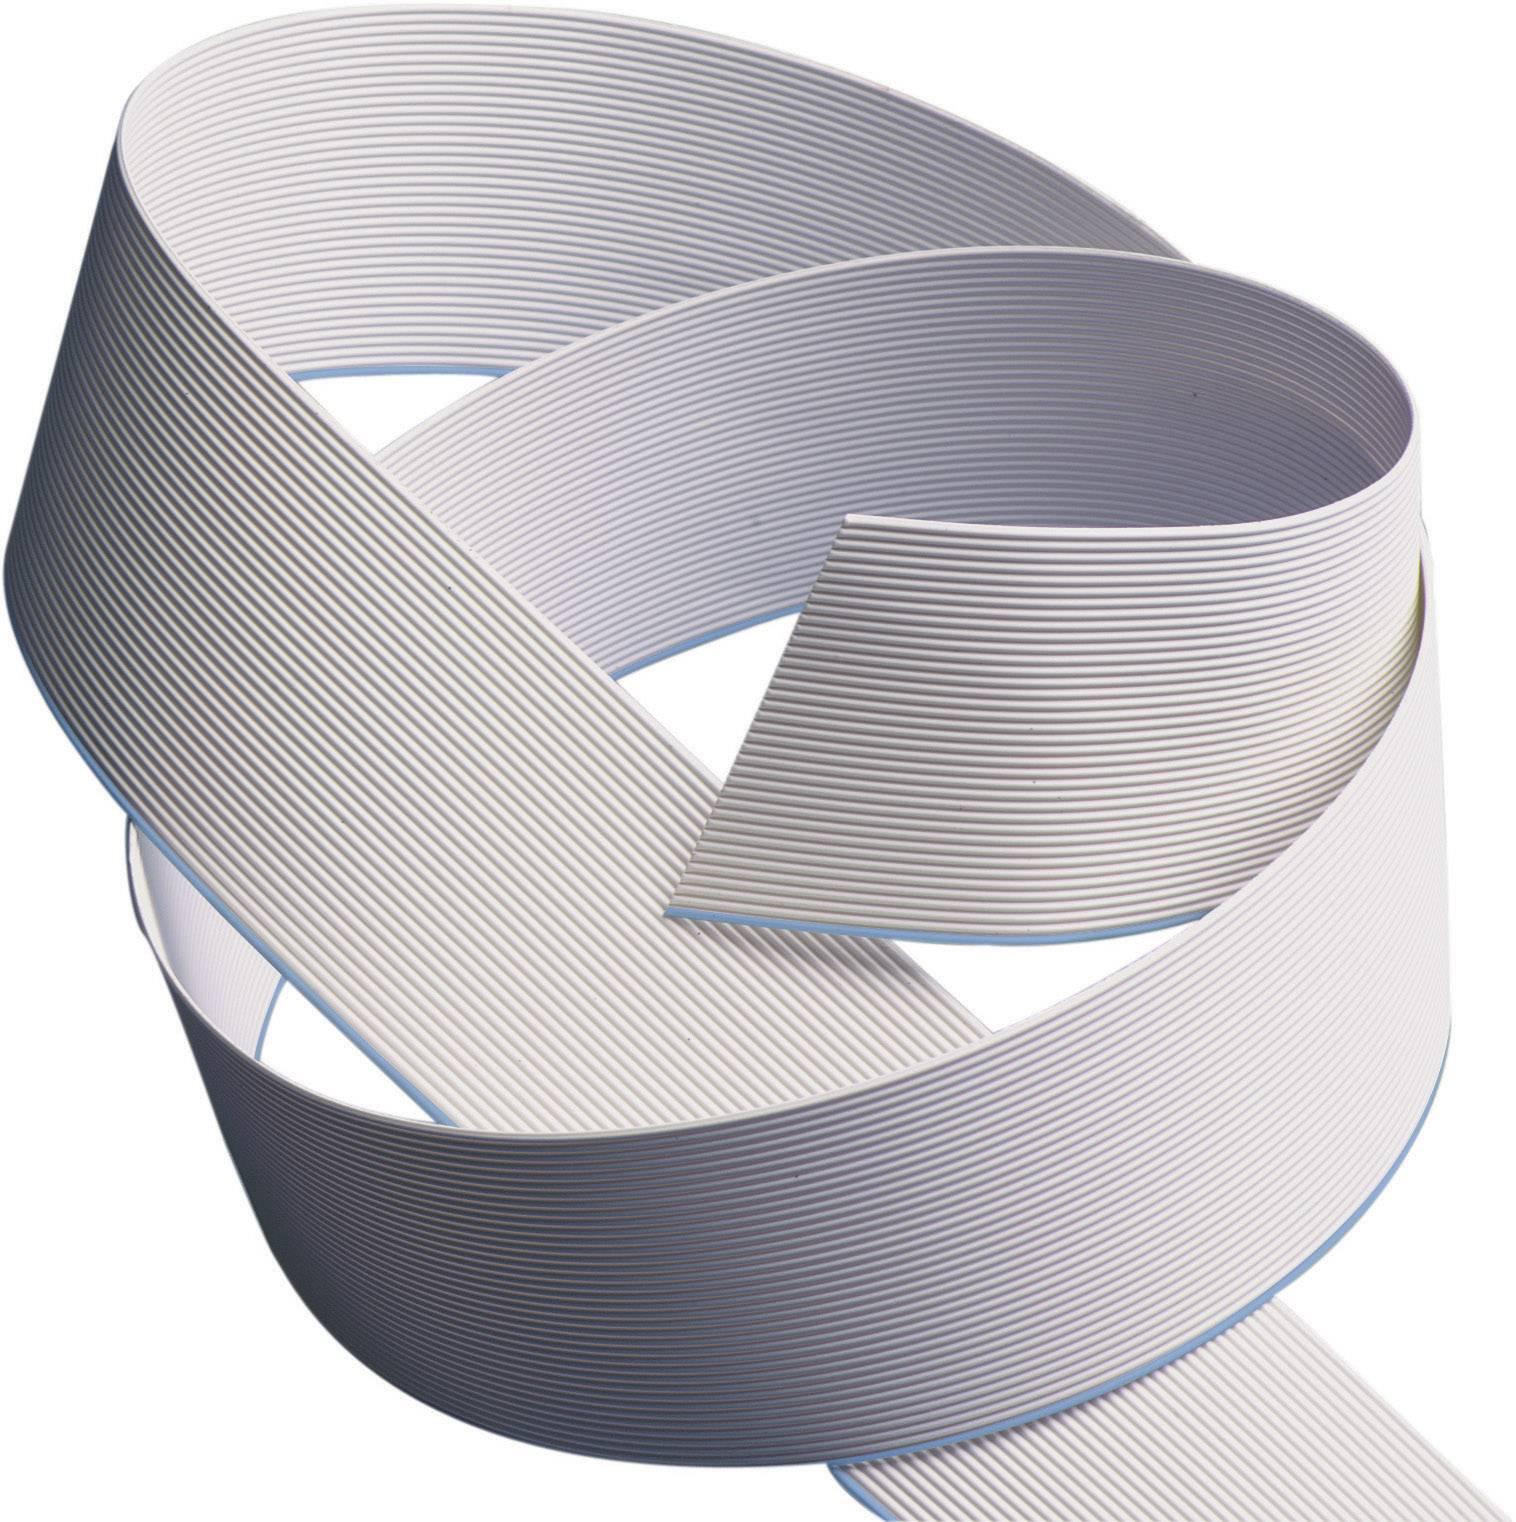 Plochý kábel 3M 7000057371, rozteč 1.27 mm, 34 x 0.08 mm², sivá, metrový tovar